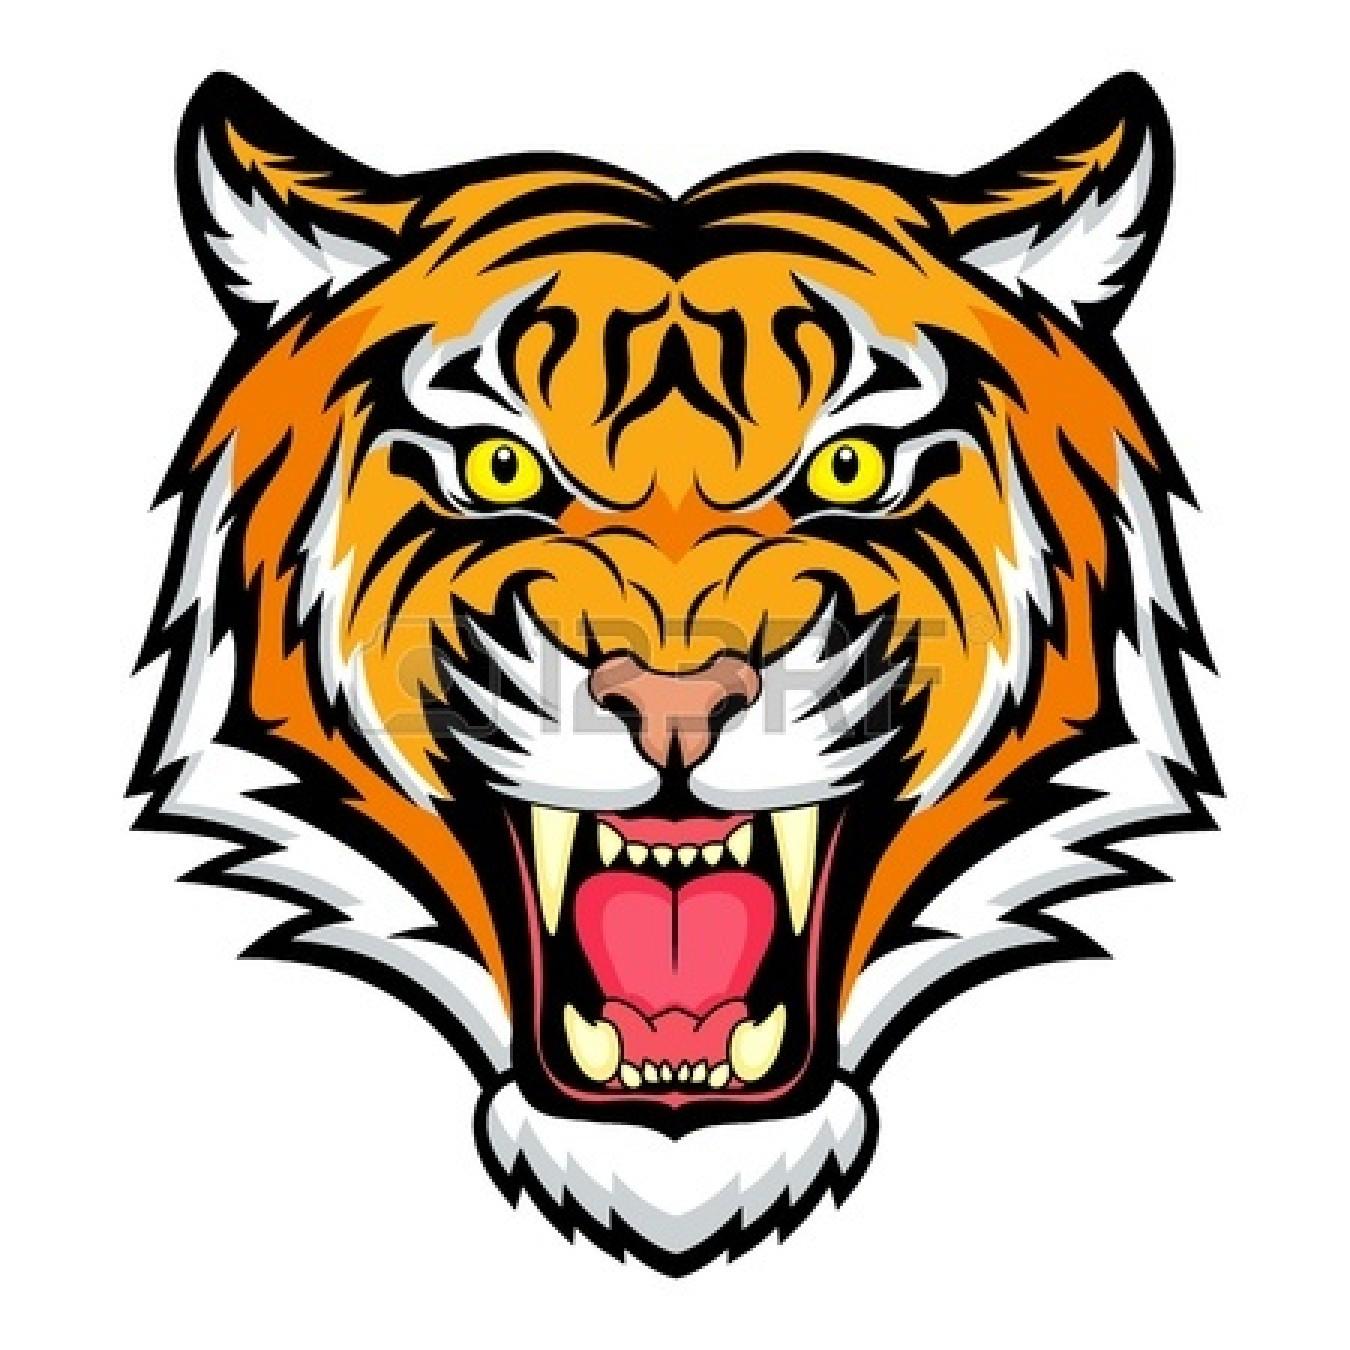 Tiger clipart download.